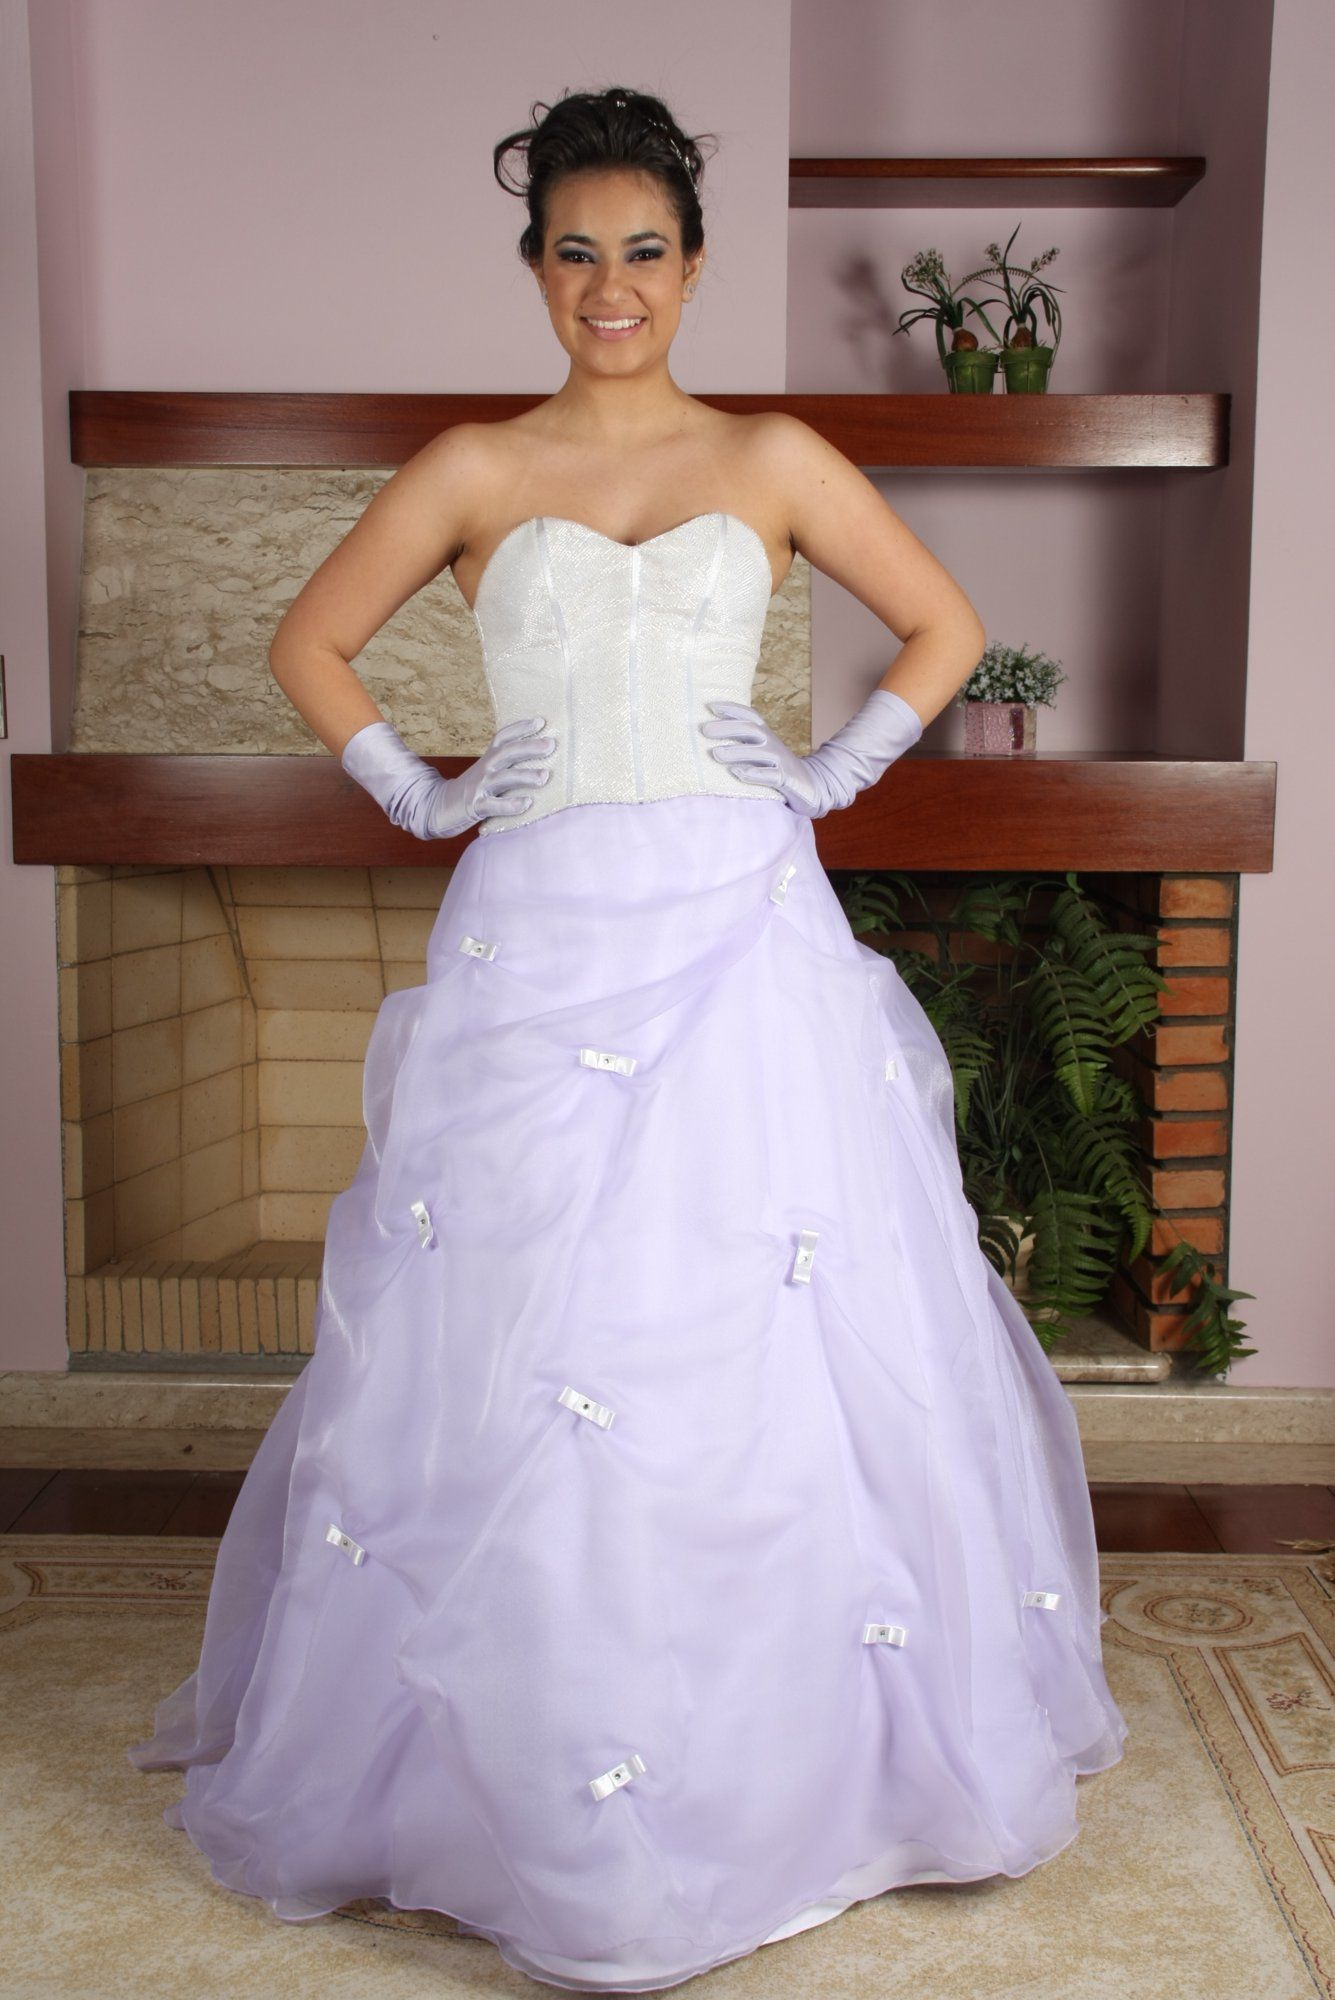 Vestido de Debutante Lilas - 6 - Hipnose Alta Costura e Spa para Noivas e Noivos - Campinas - SP Vestido de Debutante, Vestido de Debutante Lilas, Hipnose Alta Costura